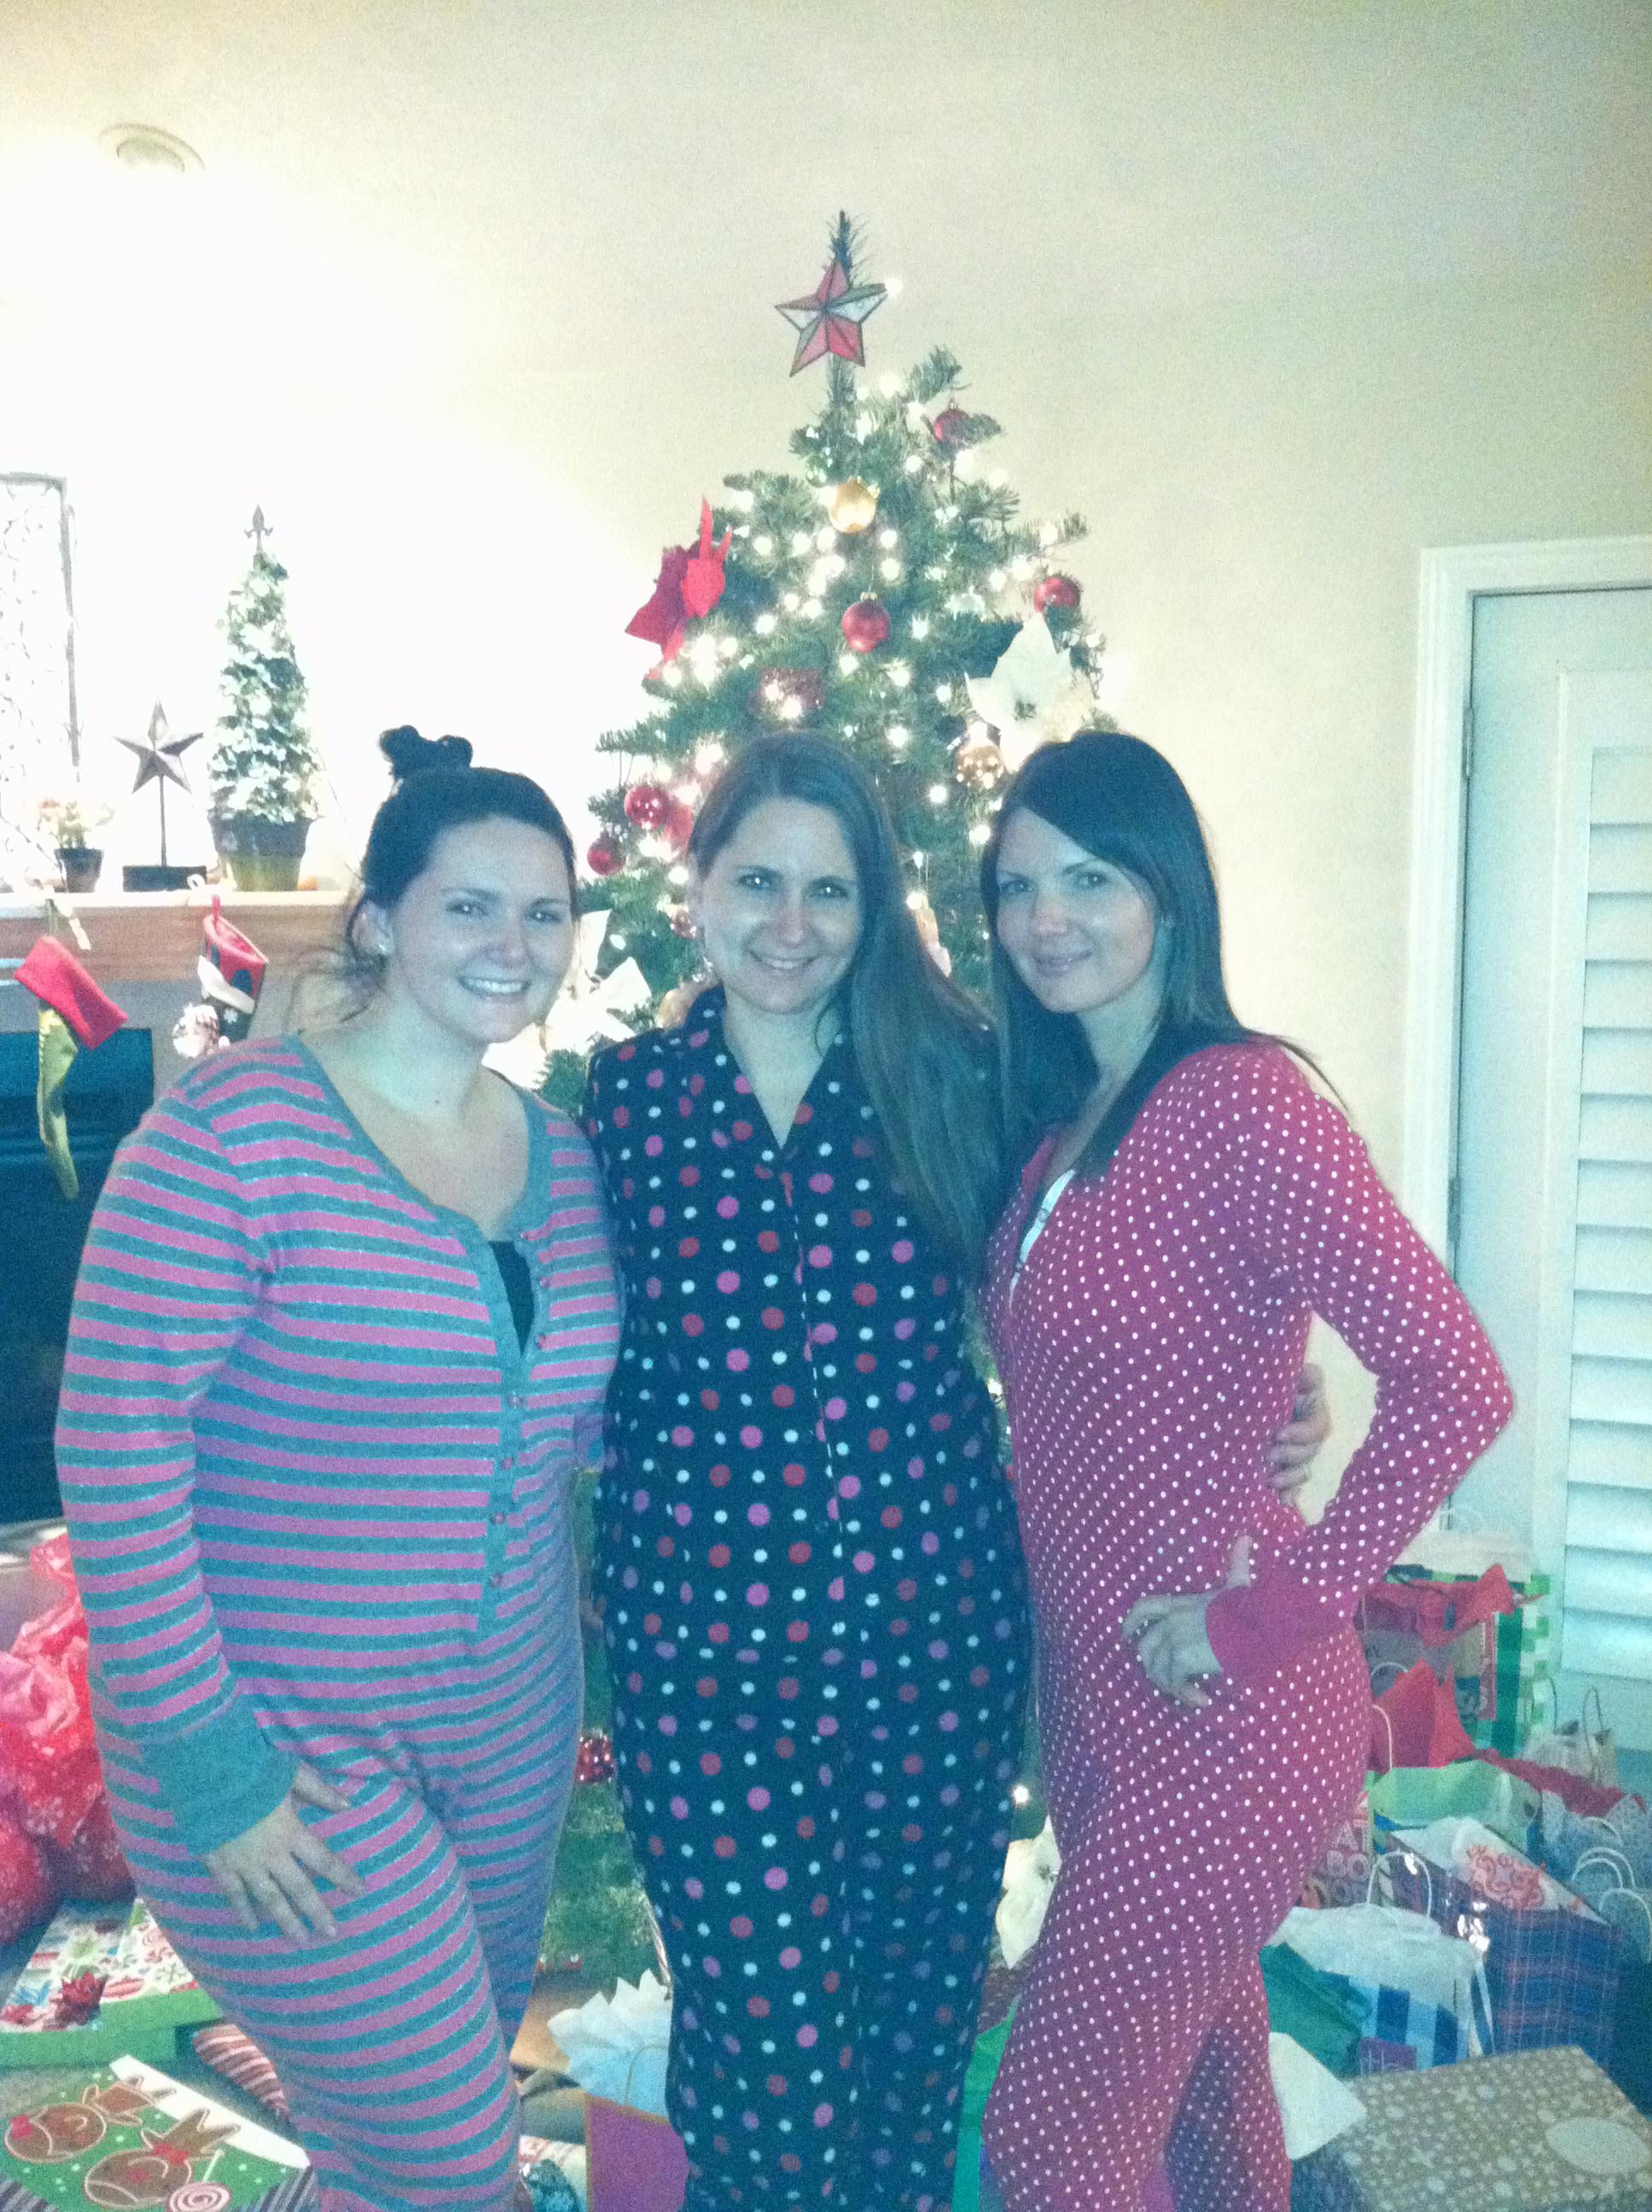 Christmas! December 25, 2012 82